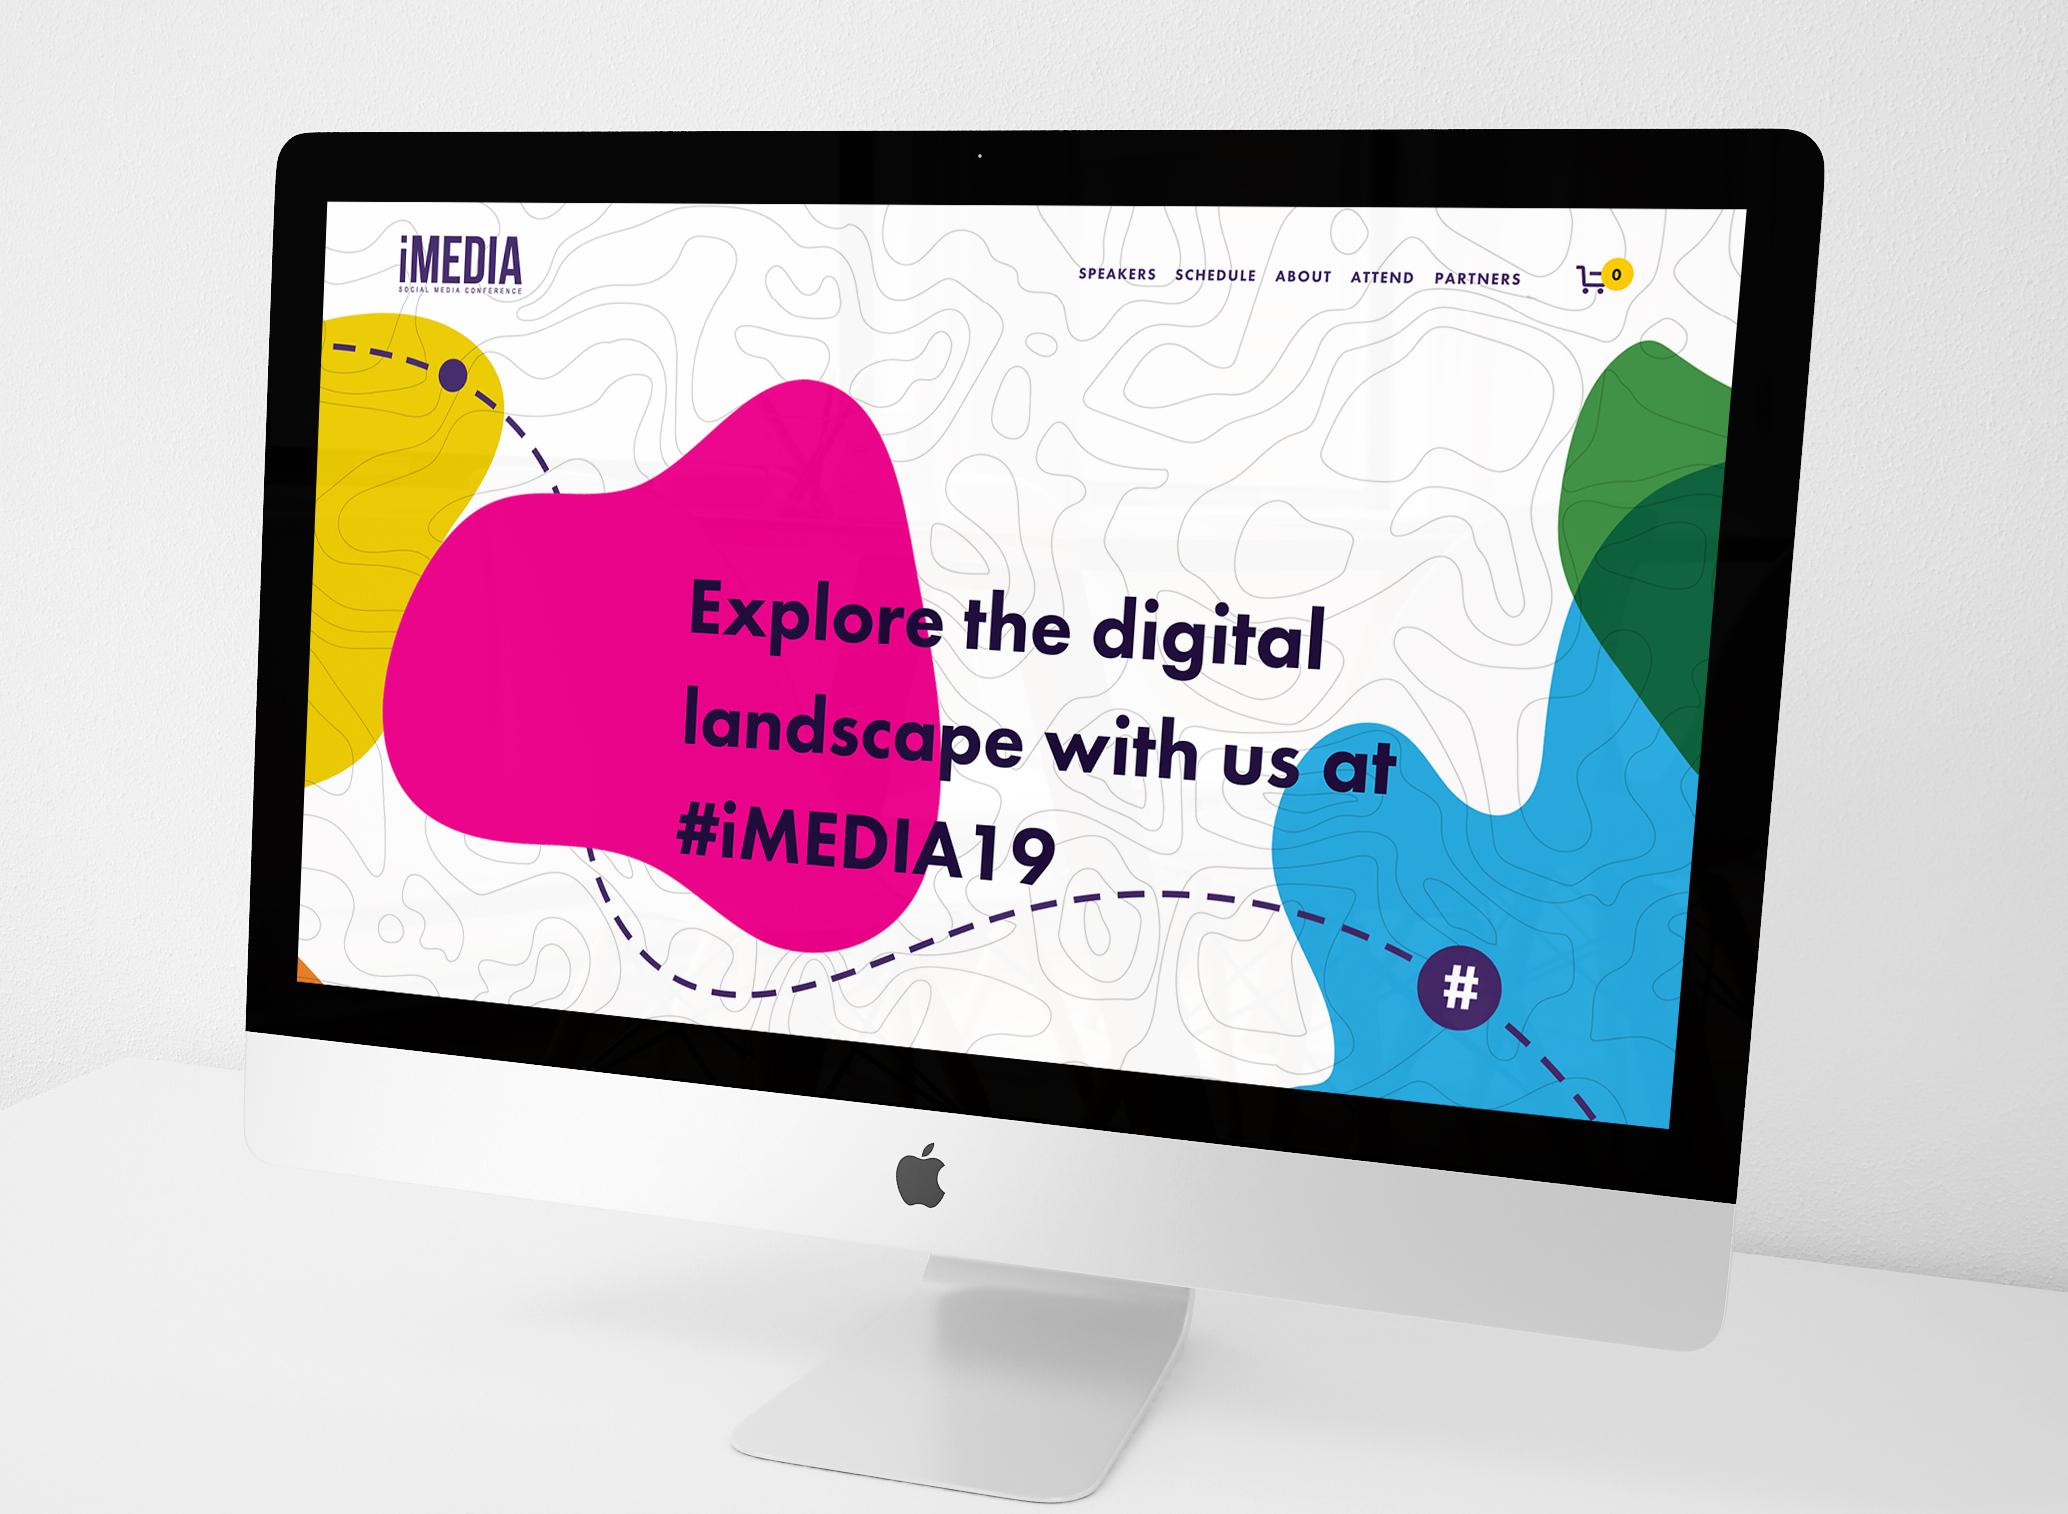 iMedia Social Media Conference Brand Toolkit Development